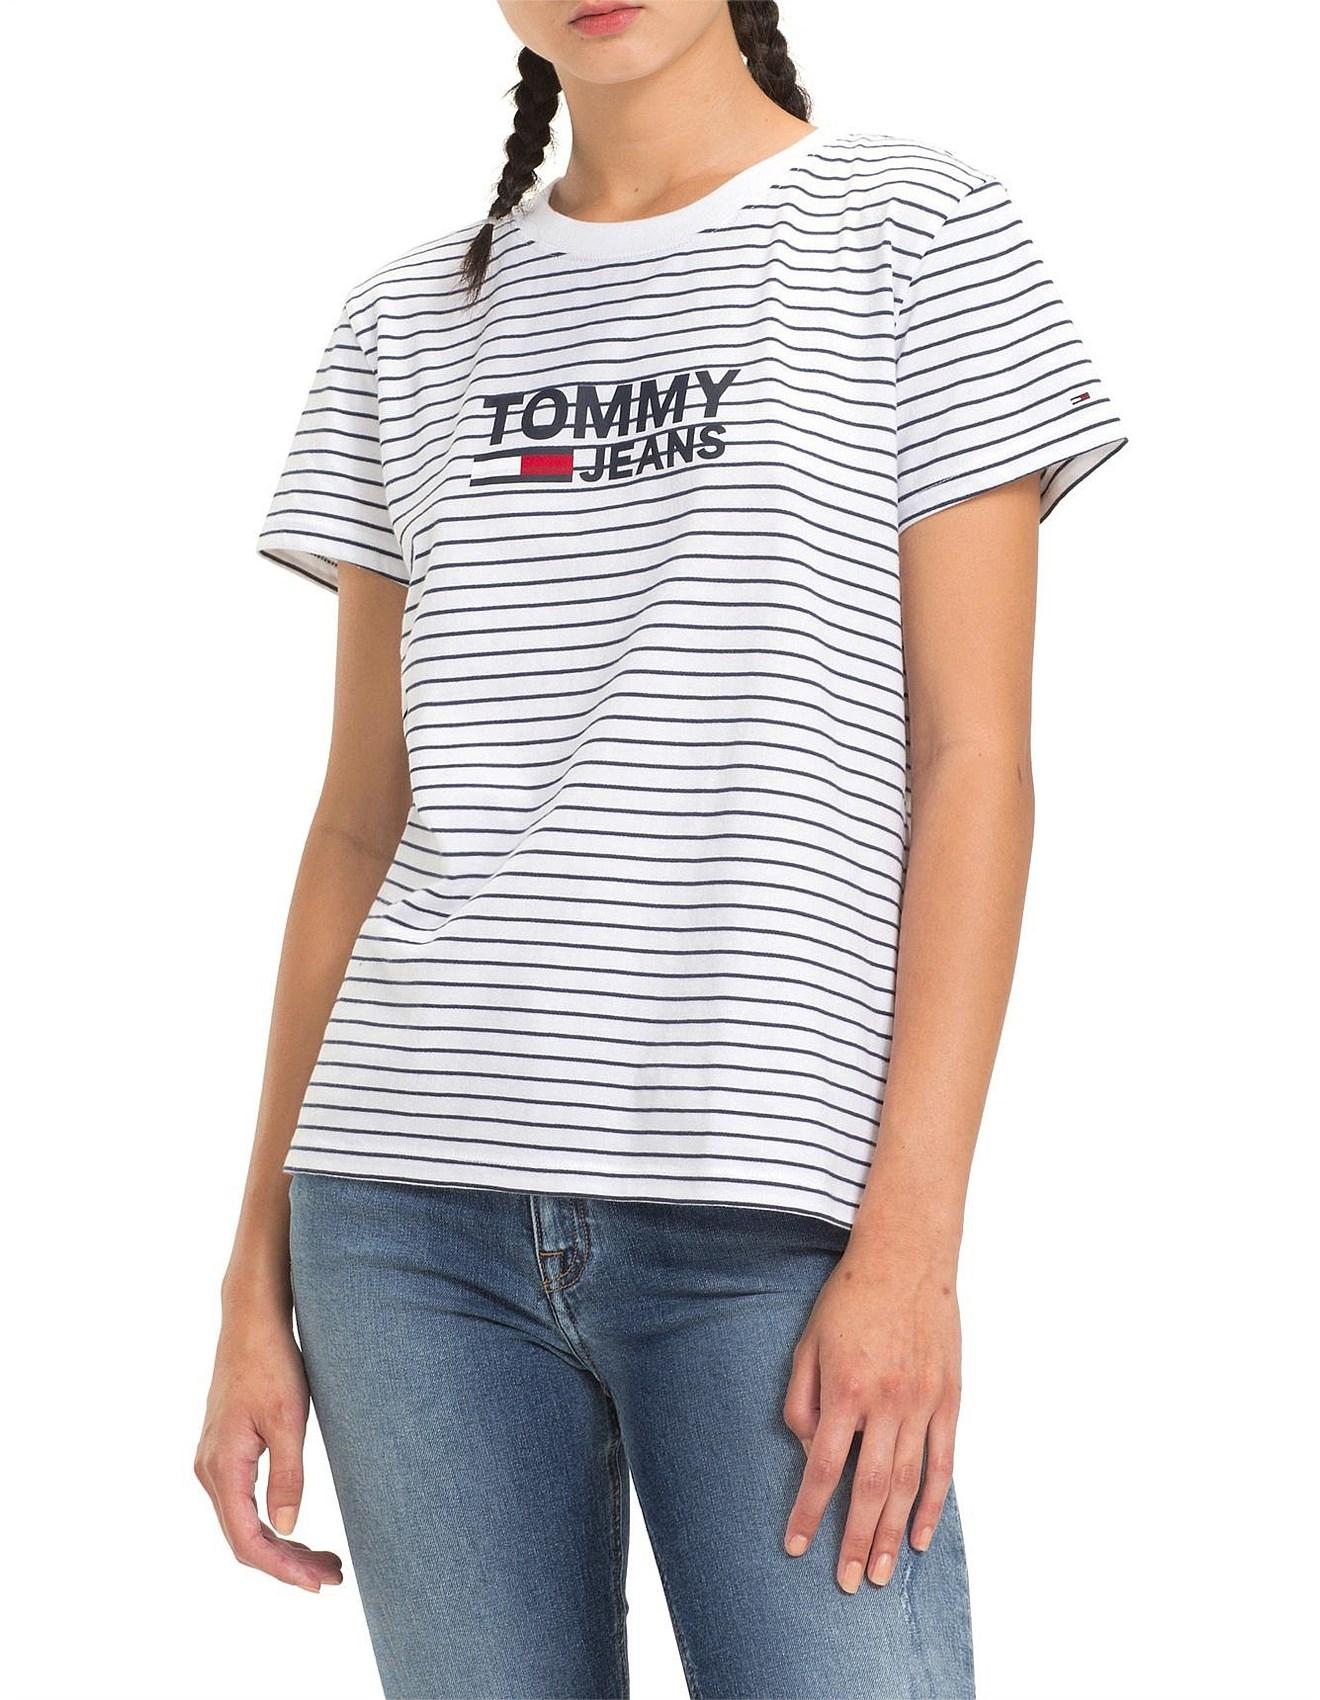 4b2fabacb Women's Tops | Tanks, T-Shirts & Sweatshirts | David Jones - Striped ...